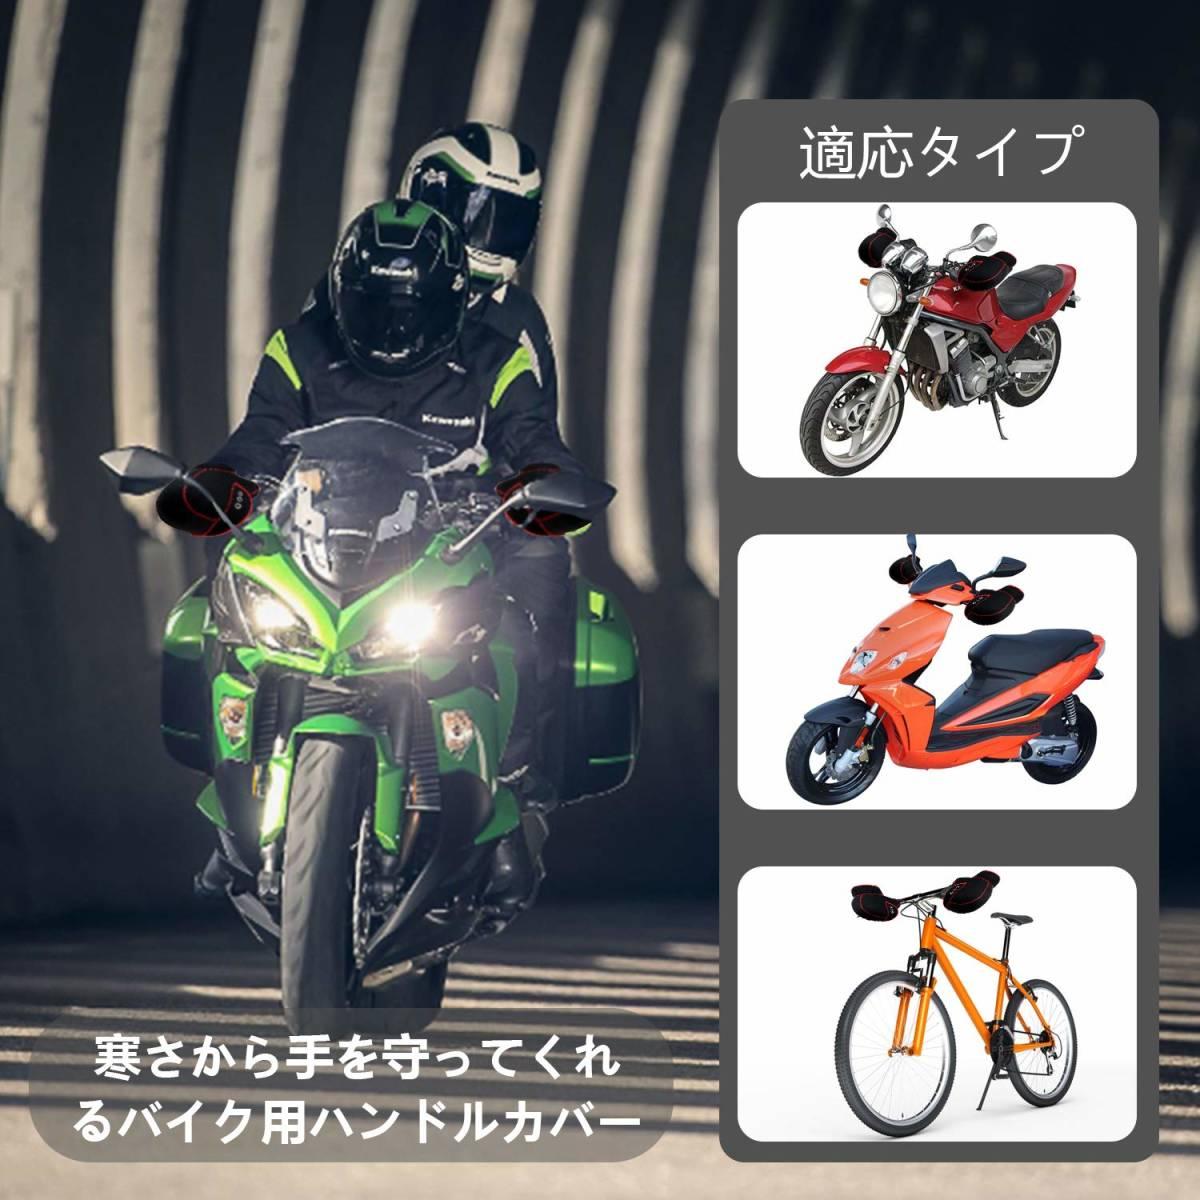 Kodi バイク用ハンドルカバー オートバイ バイク グローブ ネオプレーン ハンドルウォーマー 防寒 防水 防風 保温性抜群 汎用 ブラック_画像3